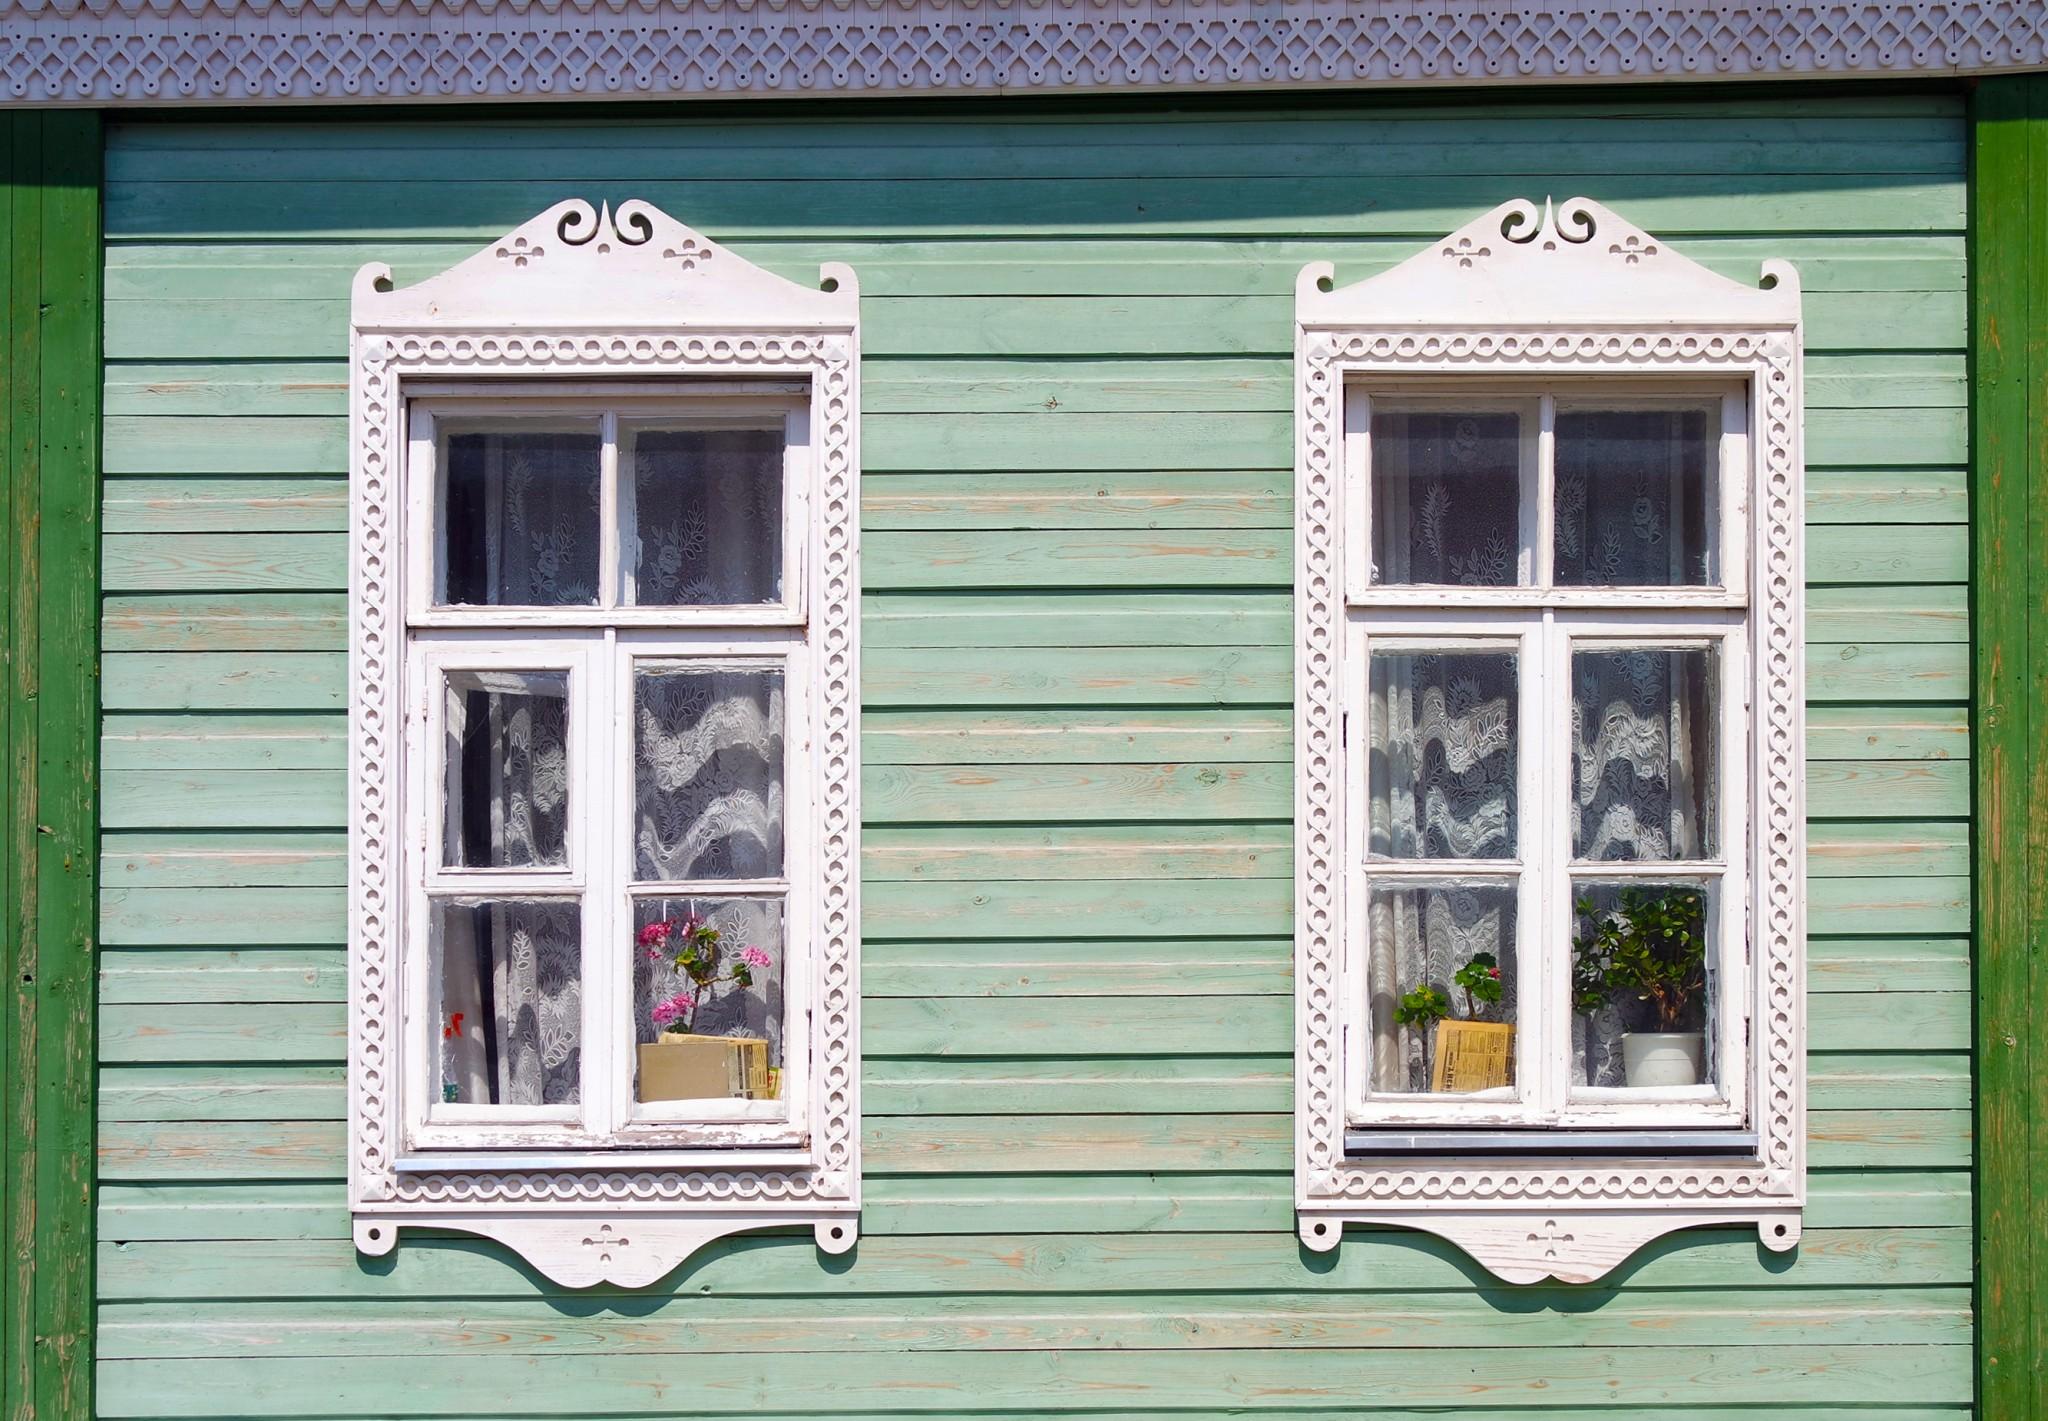 belie-nalichniki-na-zelenom-dome